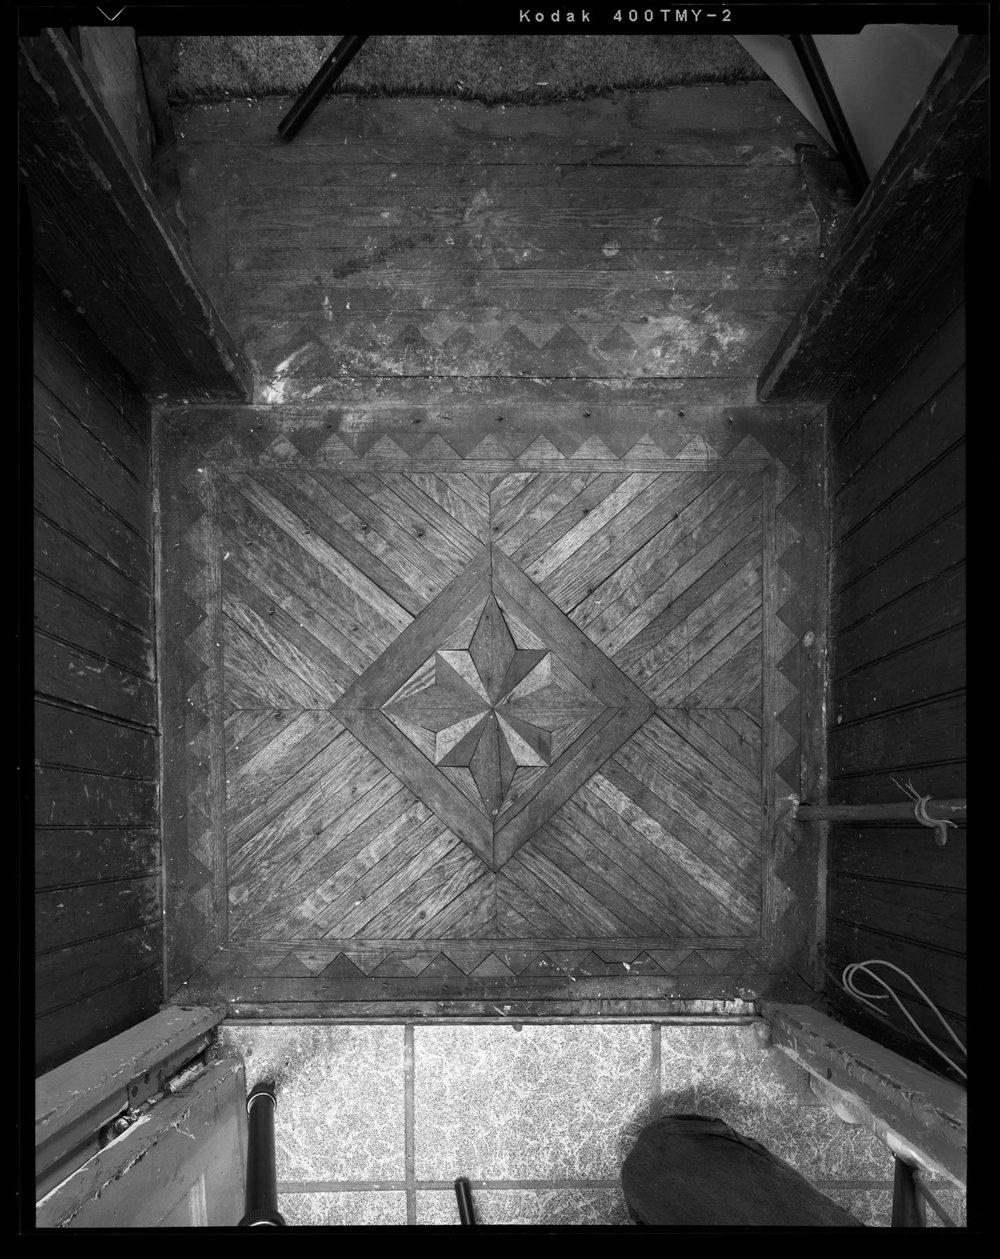 Detail_of_Closet_Floor_Medallion.jpg